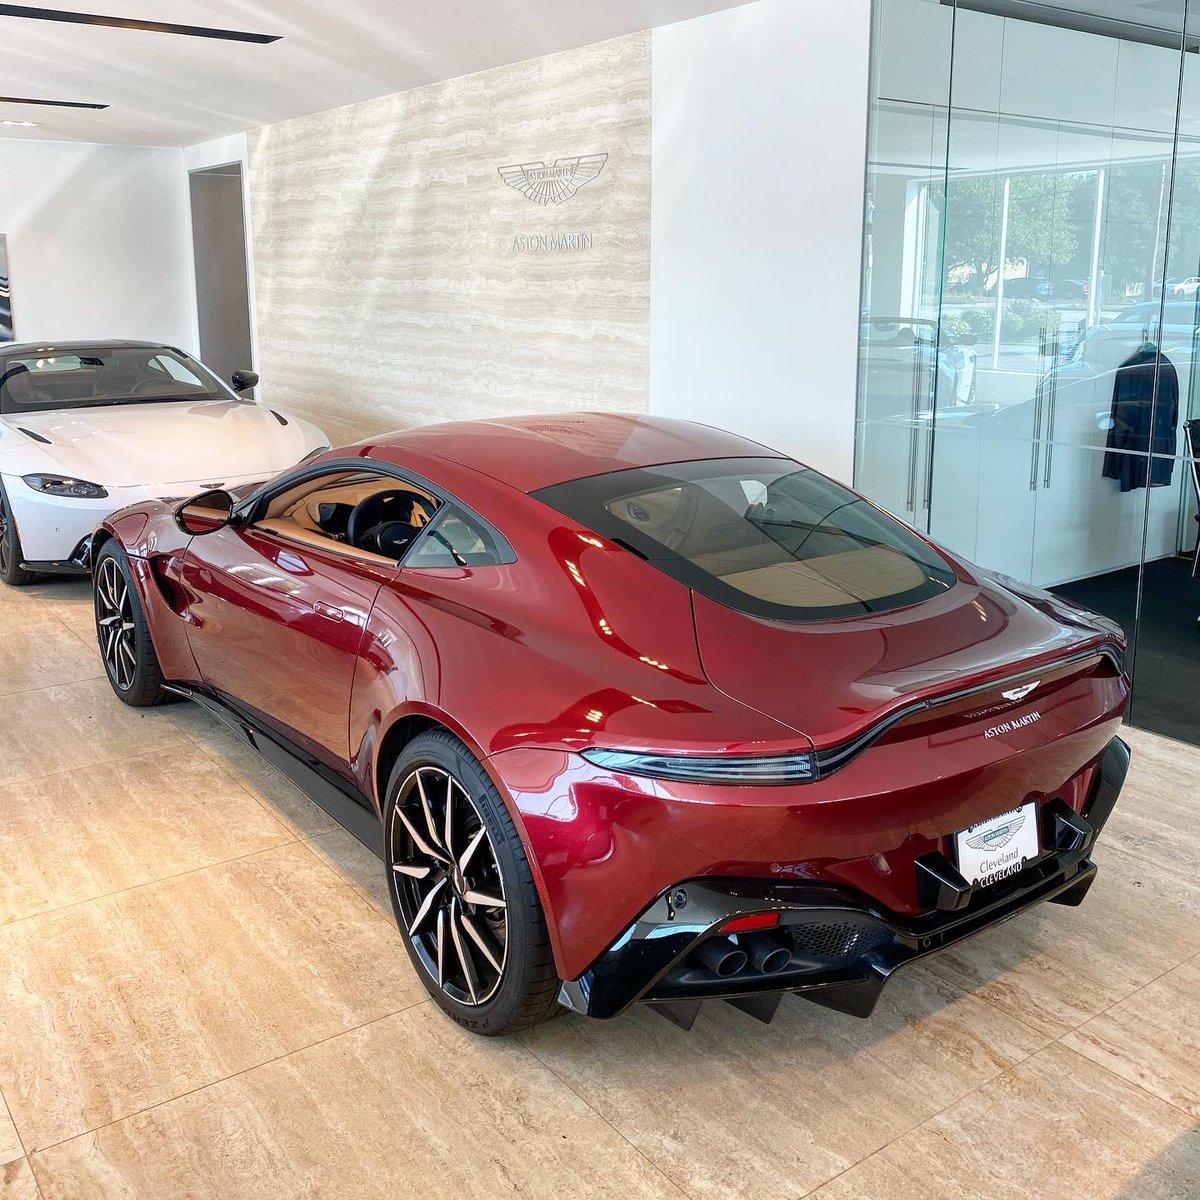 Aston Martin Cle Astonmartin Cle Twitter